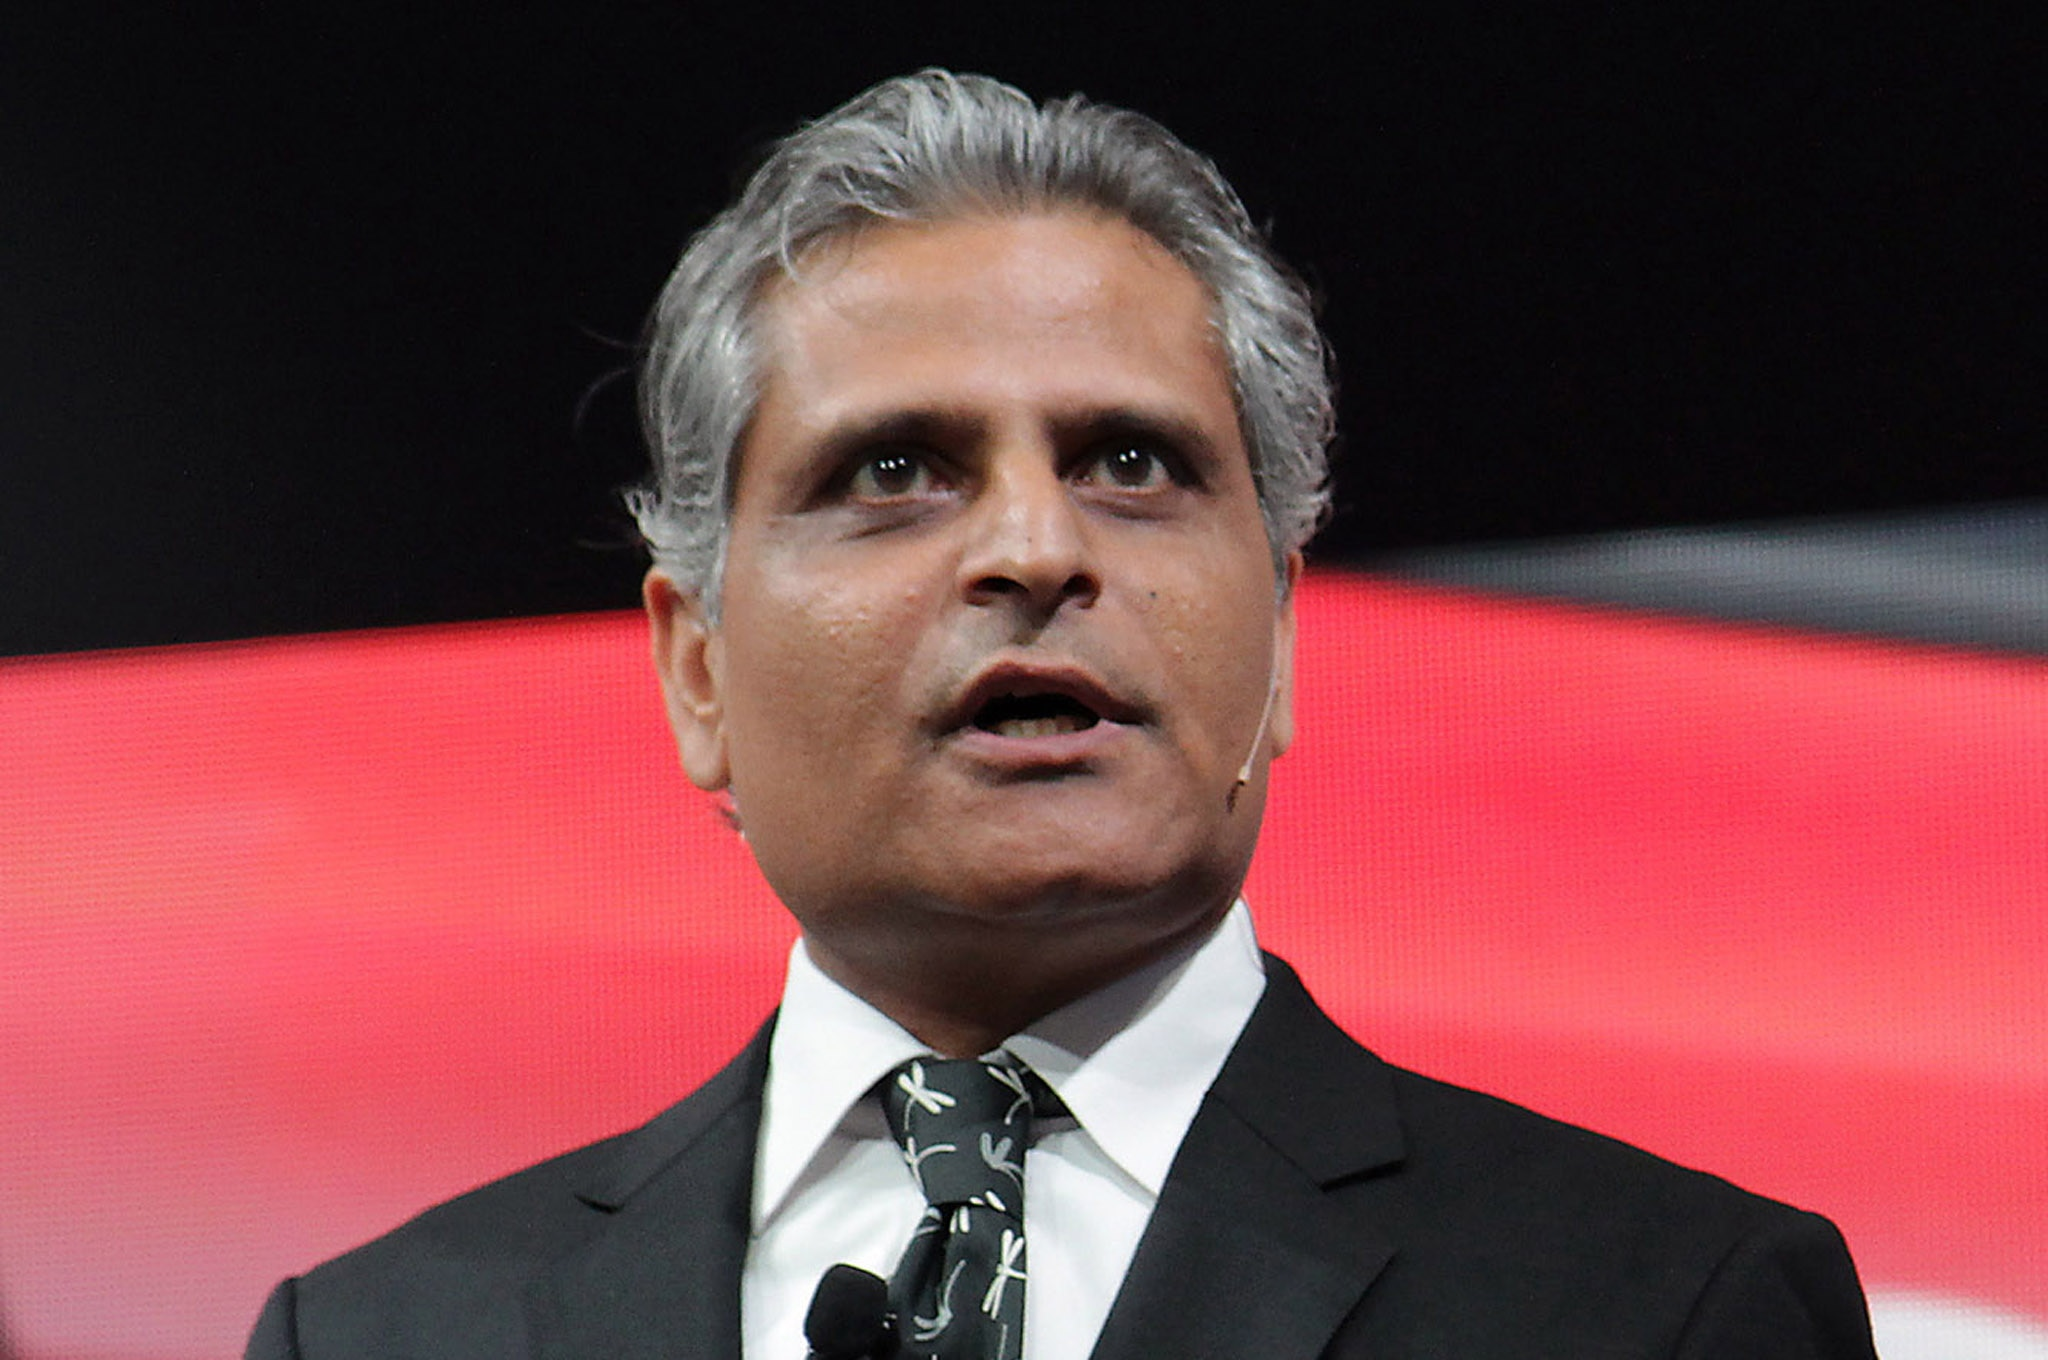 Kumar Galhotra Ford Headshot